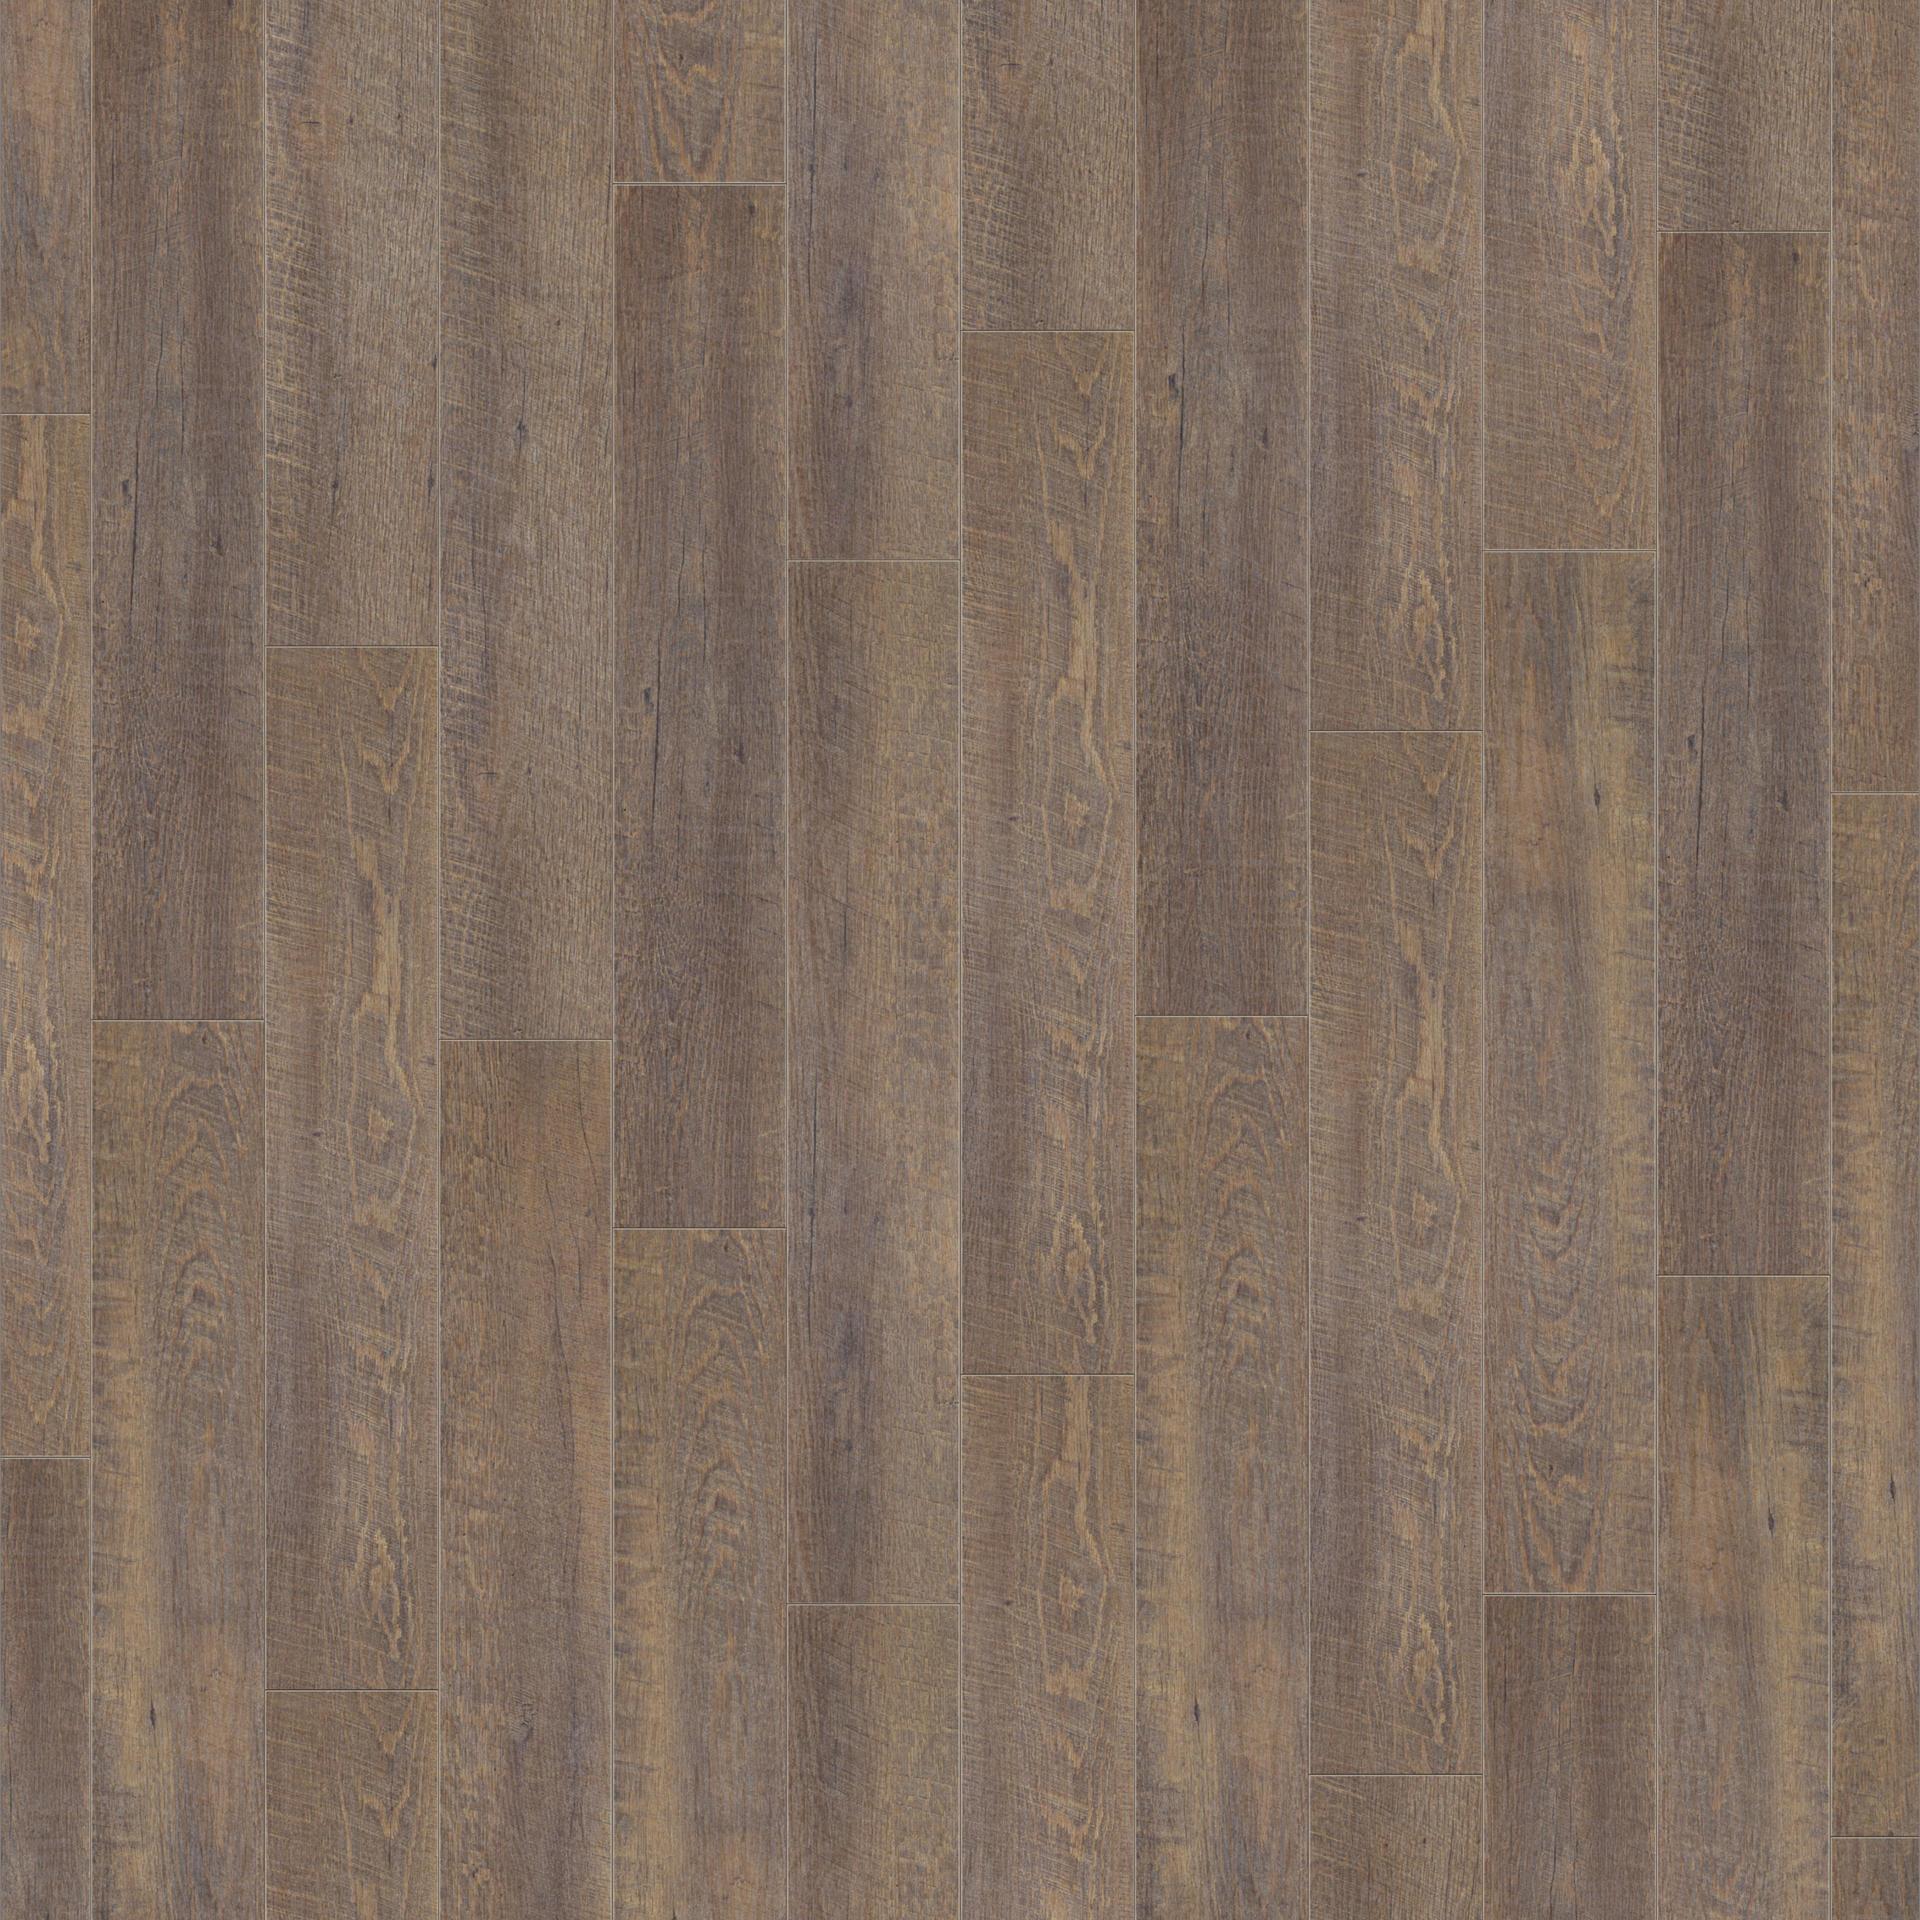 Плитка виниловая ПВХ Tarkett Lounge (buddha), 152.4x914.4 мм